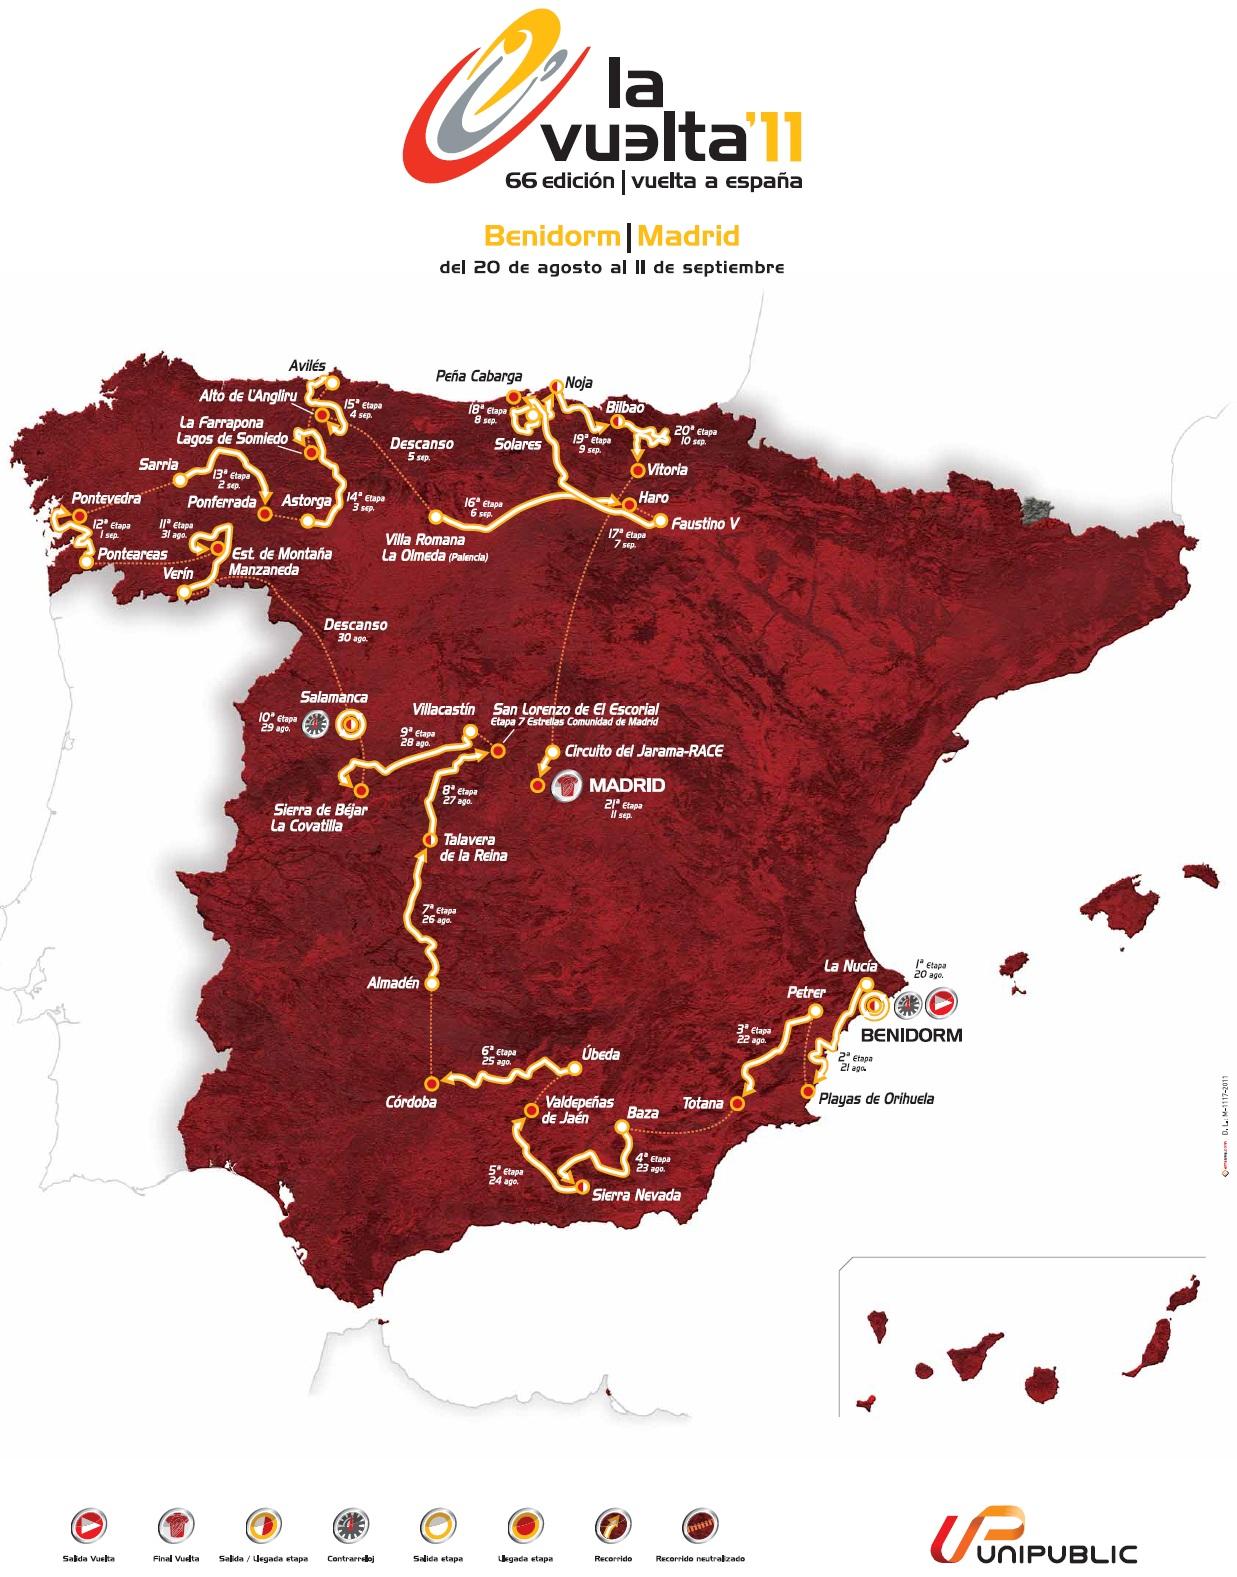 Streckenverlauf Vuelta a España 2011